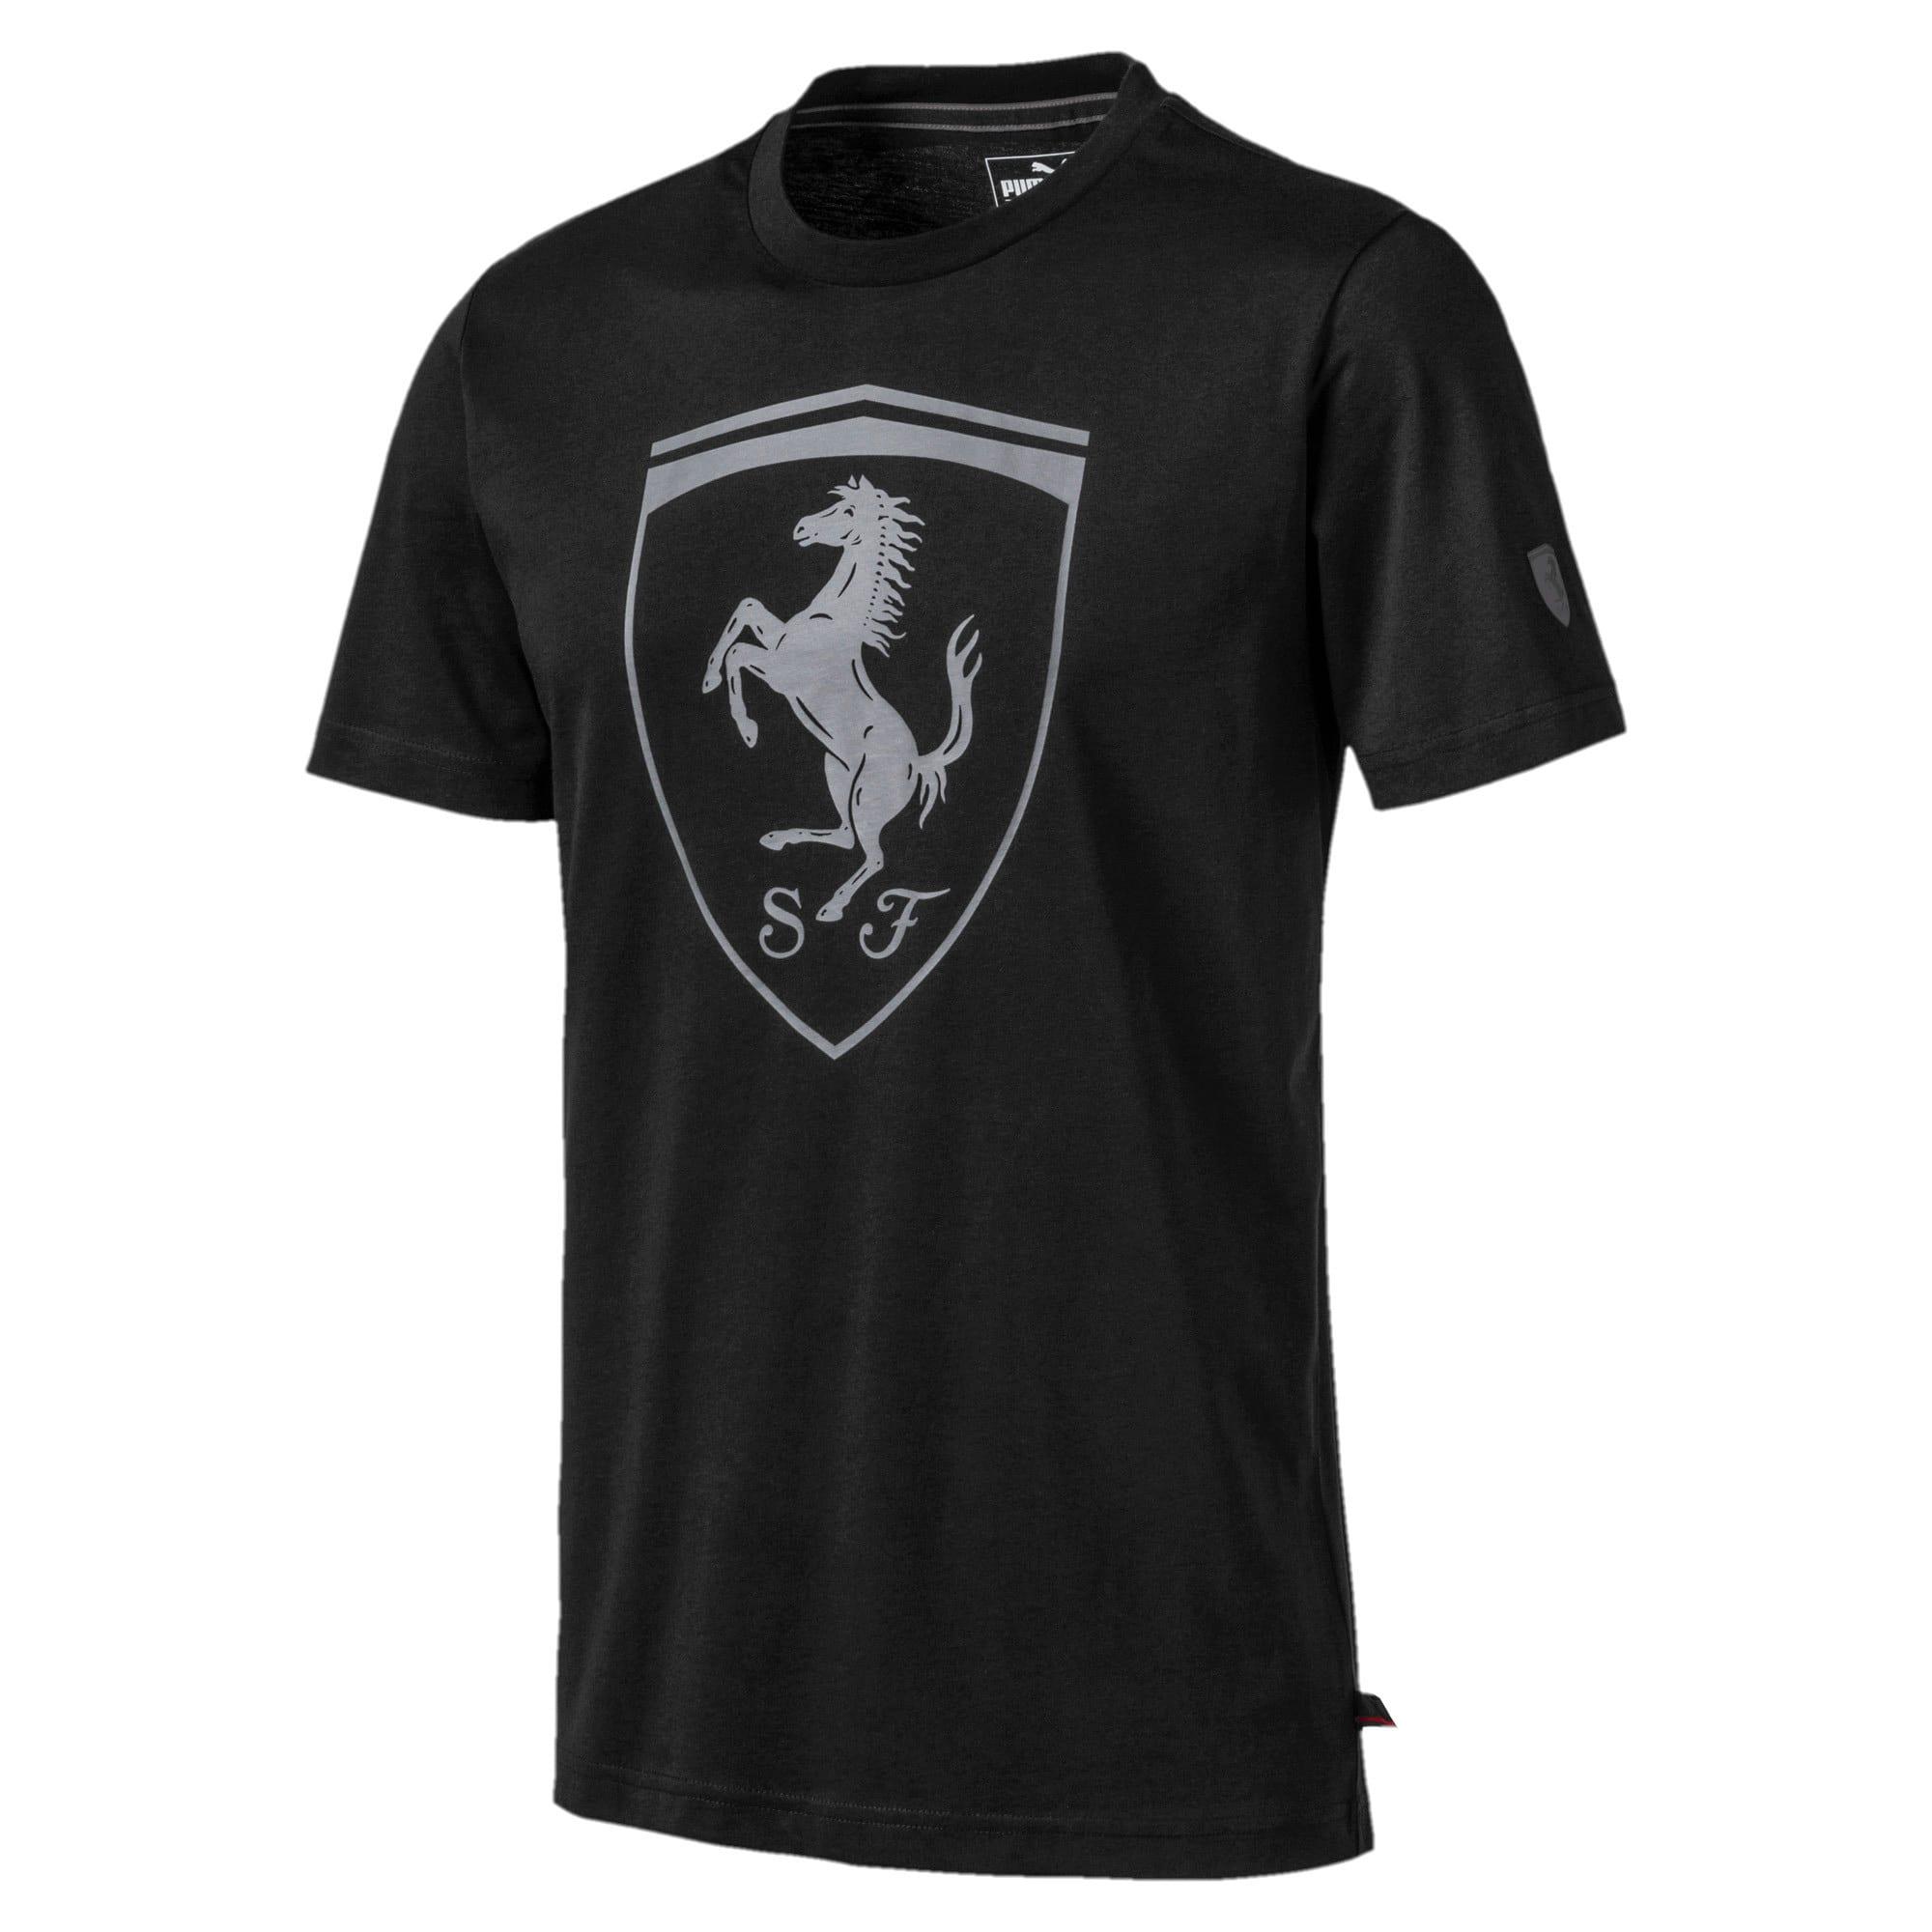 Thumbnail 5 of Ferrari Big Shield Men's Tee, Puma Black, medium